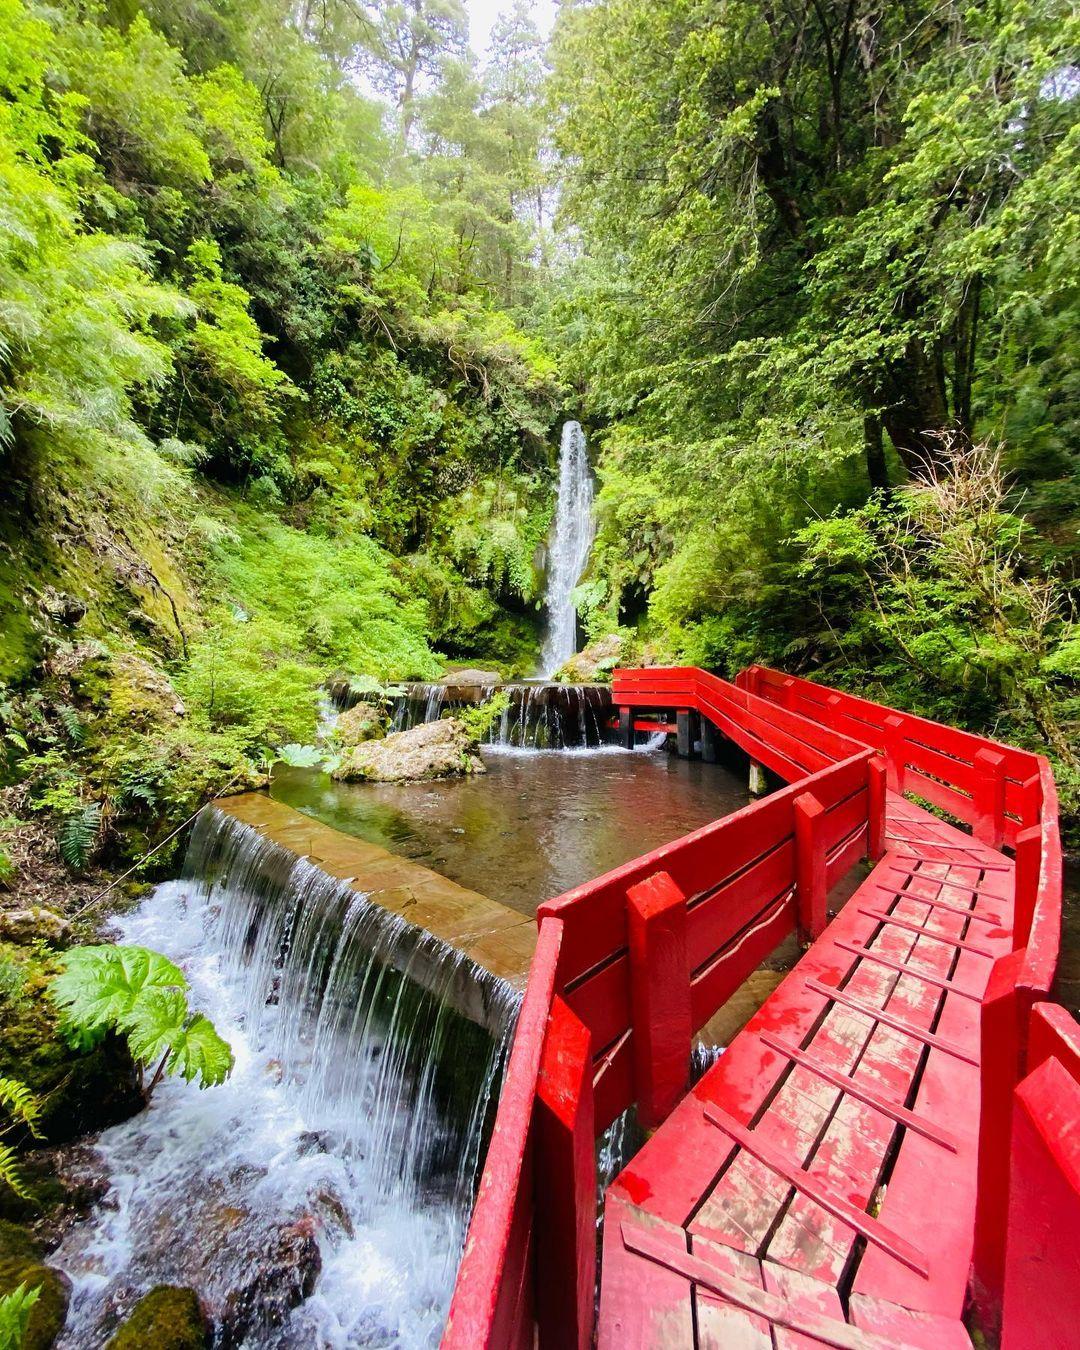 Wasserfall inmitten der Vegetation in den Termas Geométricas